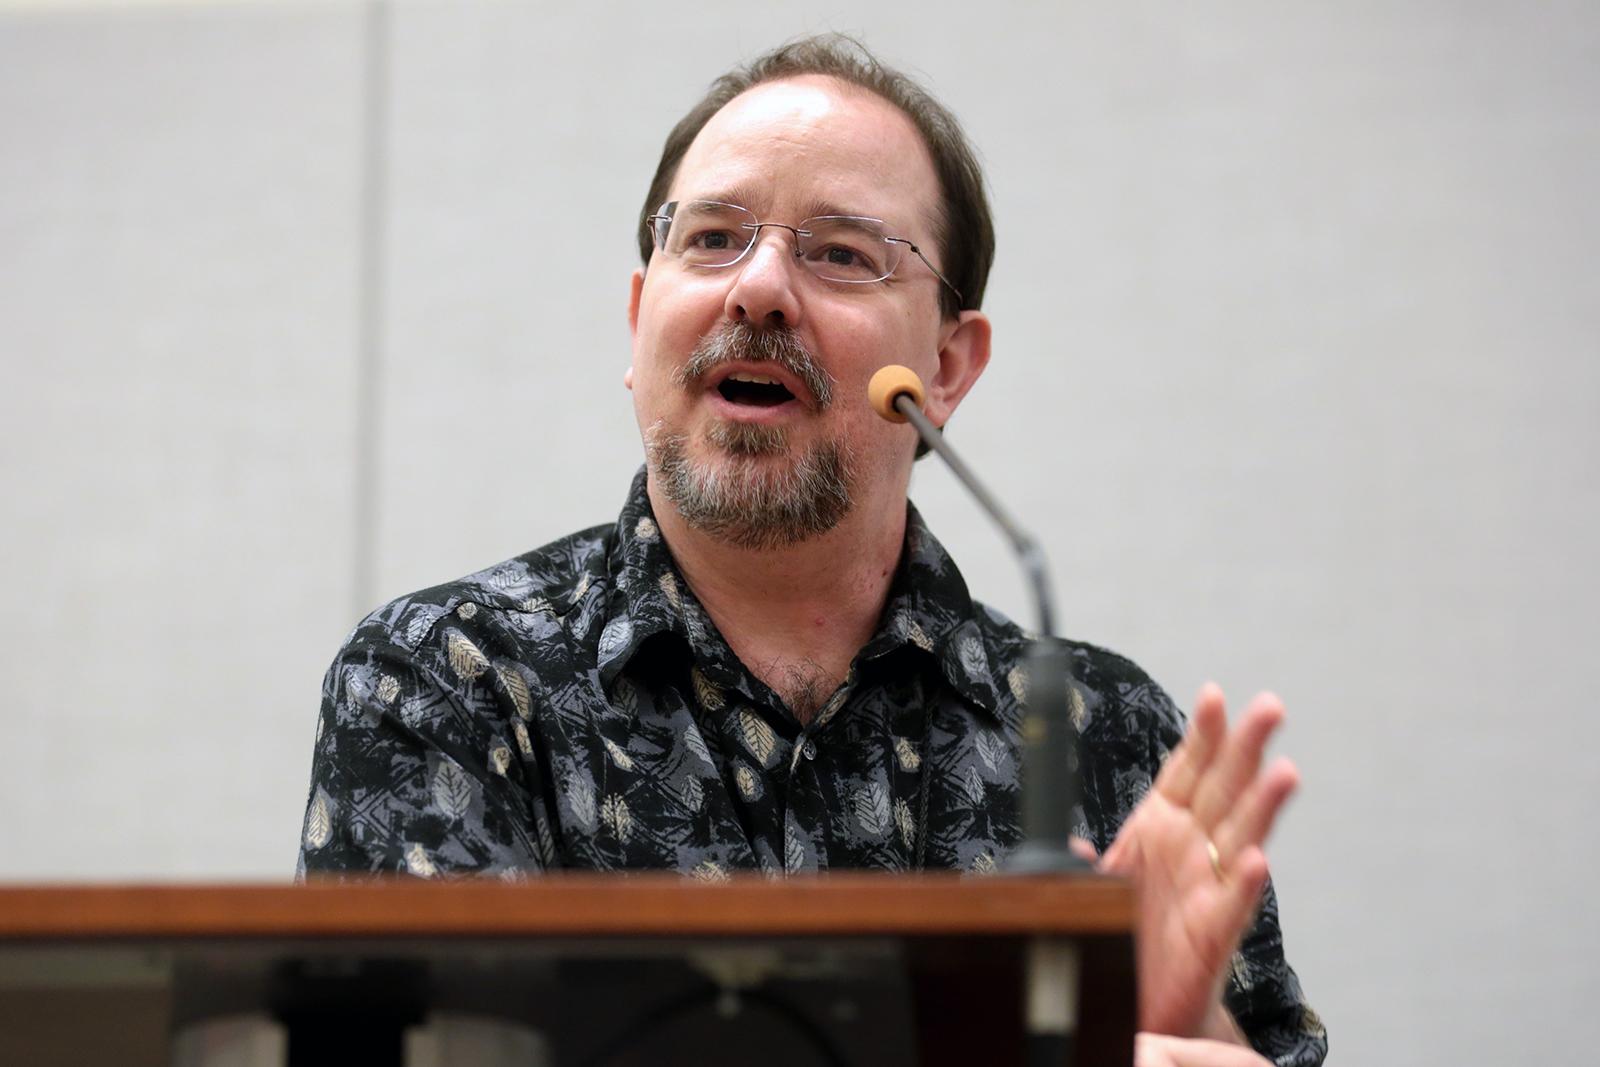 John Scalzi on Messiahs, the Apocalypse, Coronavirus, and Religion in Science Fiction